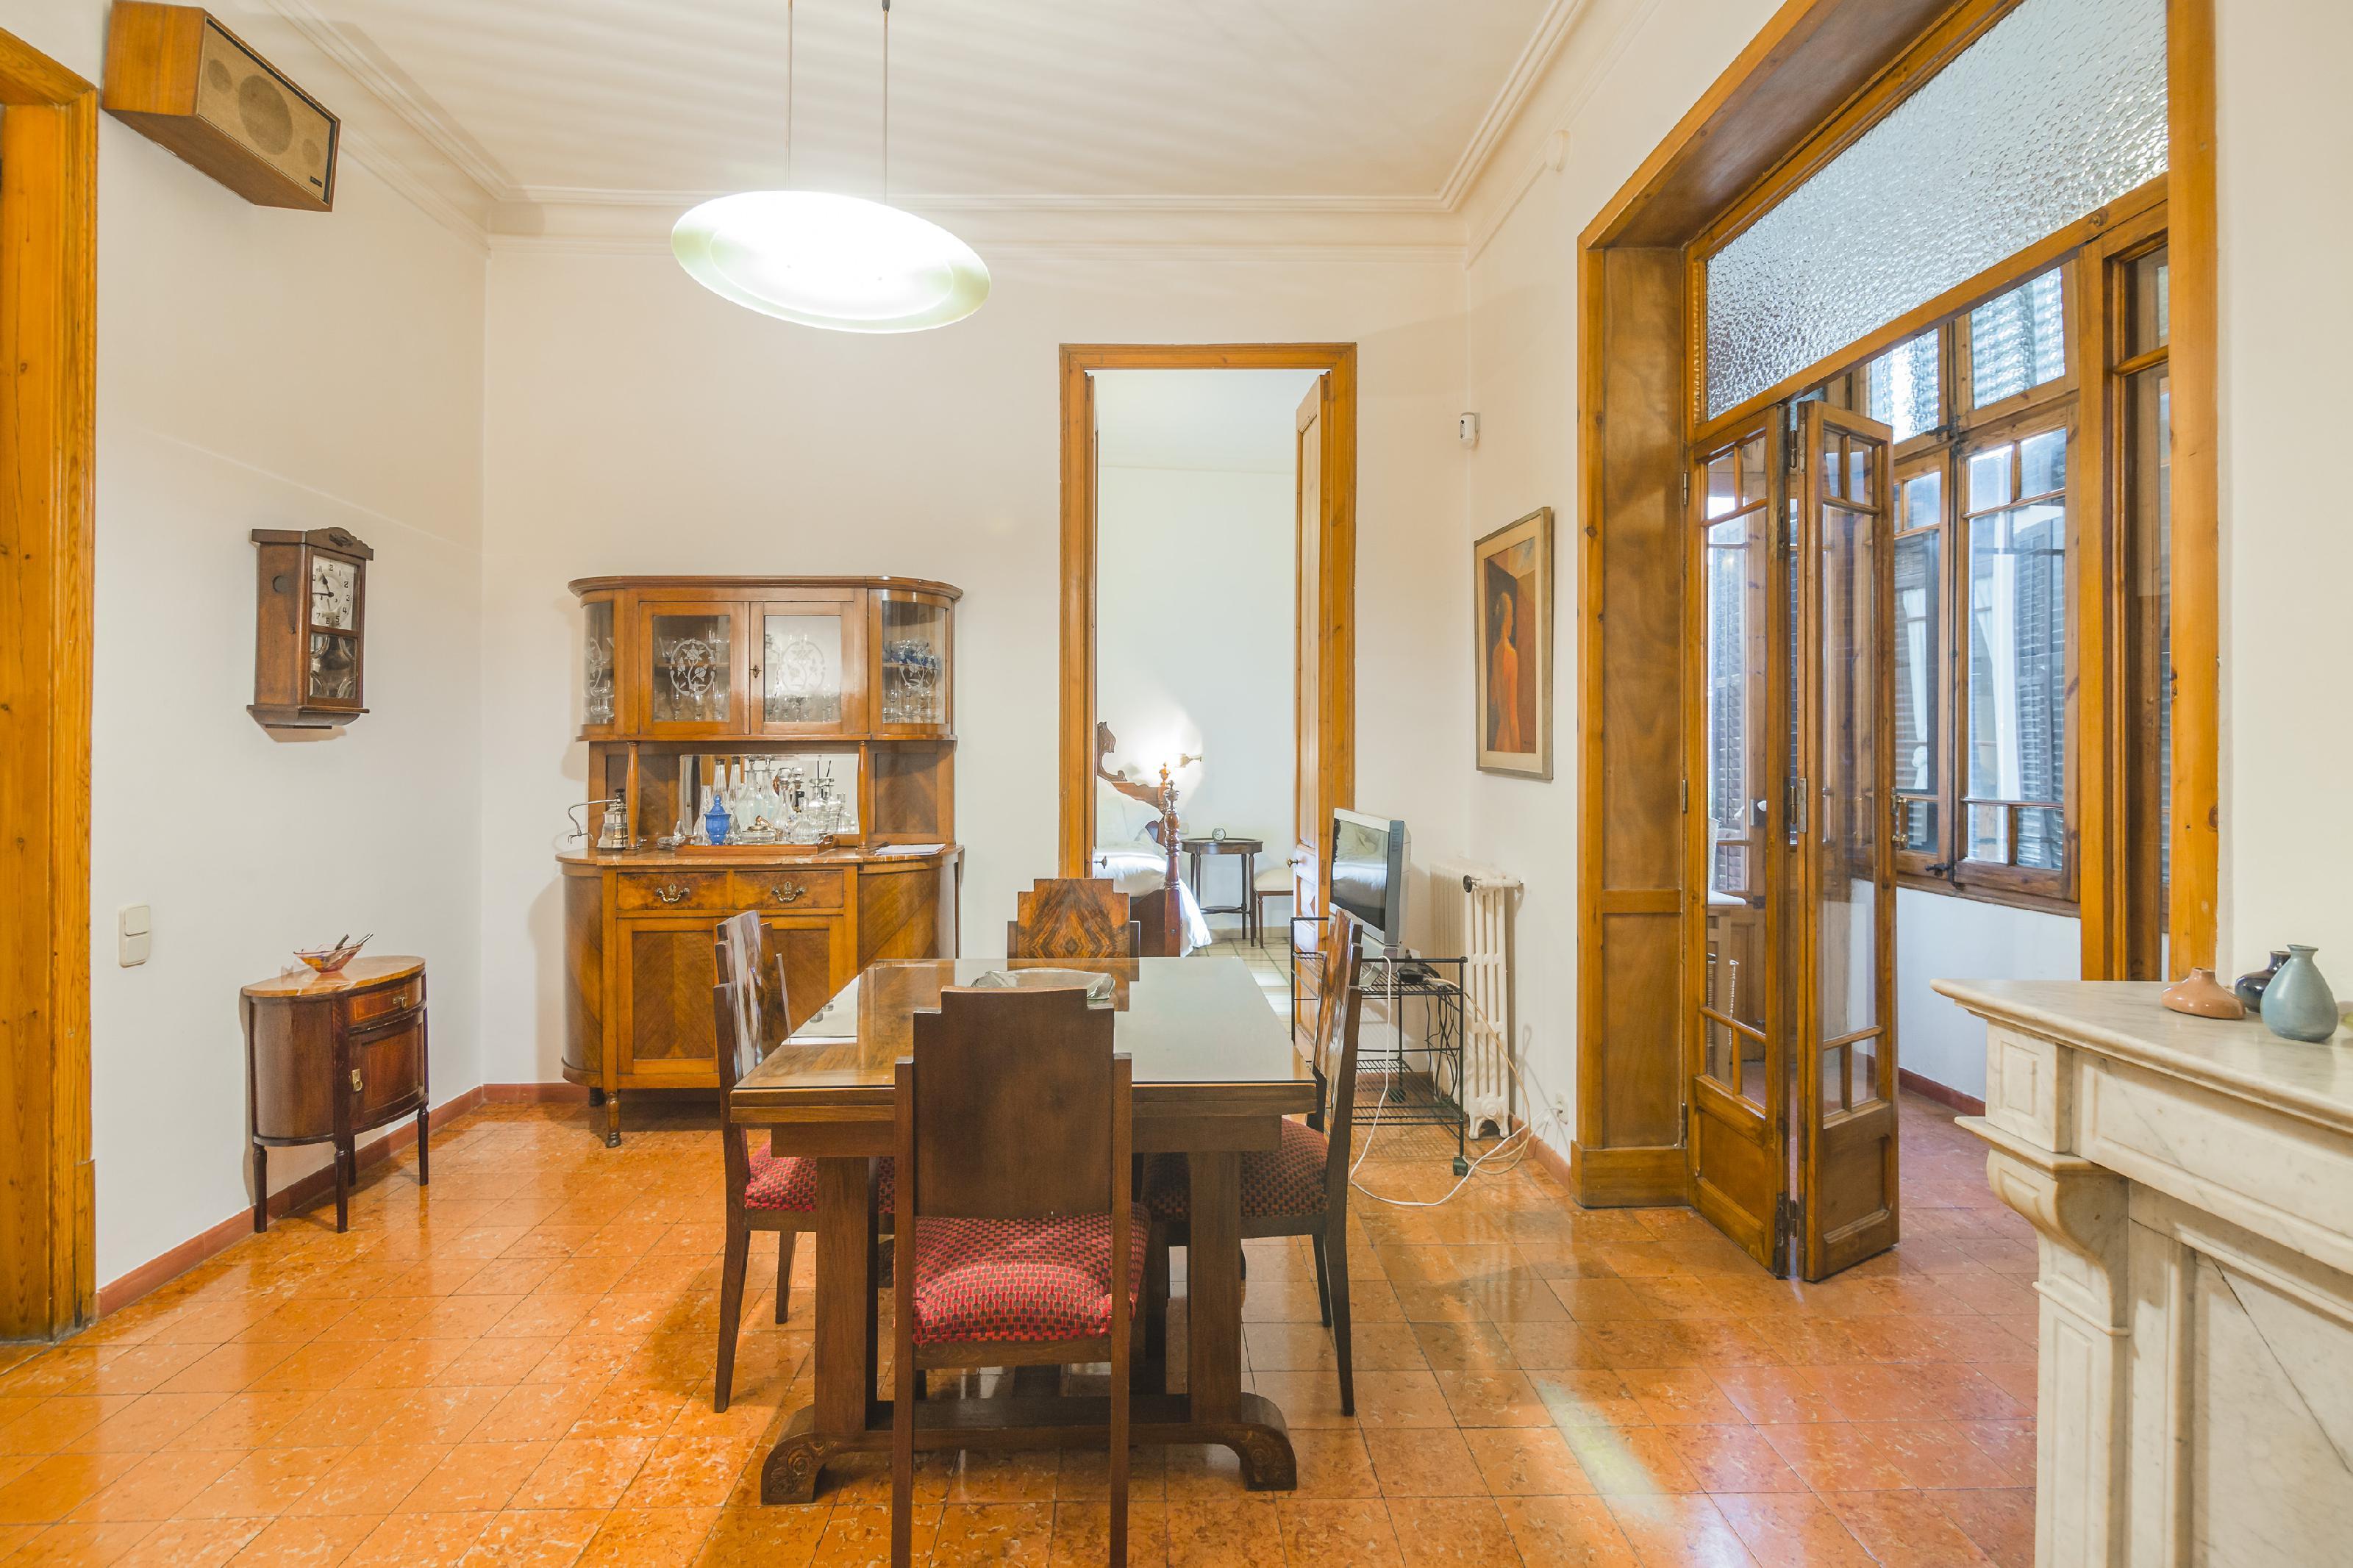 250020 Piso en venda en Gràcia, Vila de Gràcia 21